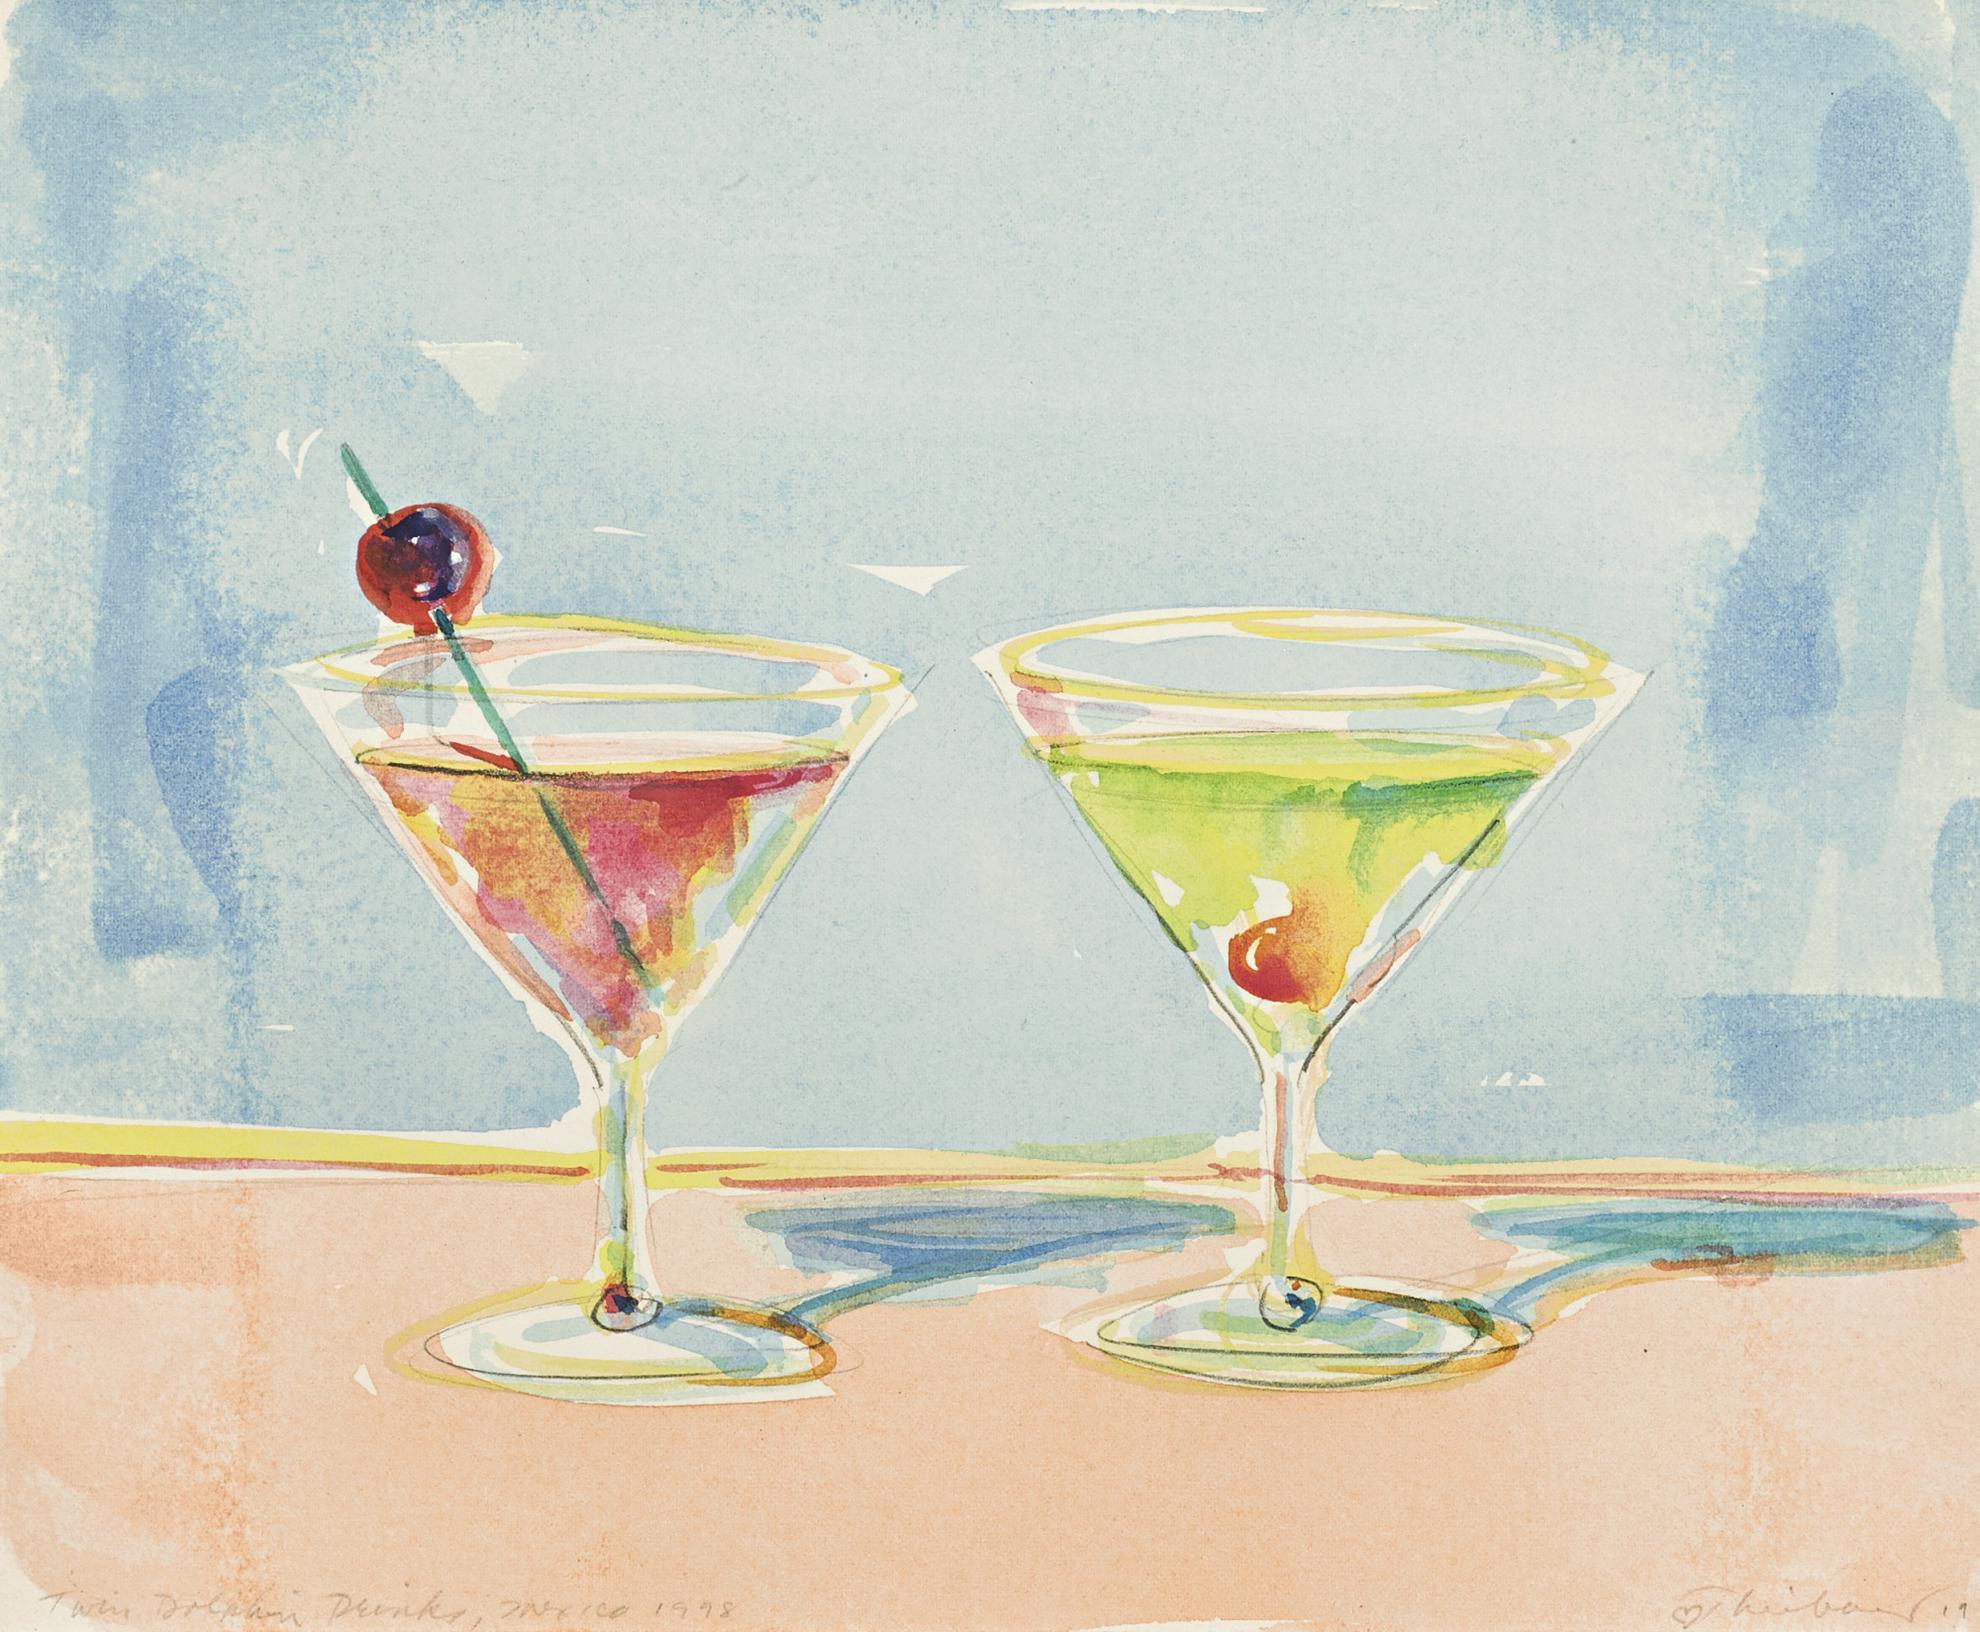 Wayne Thiebaud-Twin Dolphin Drinks, Mexico 1998-1998